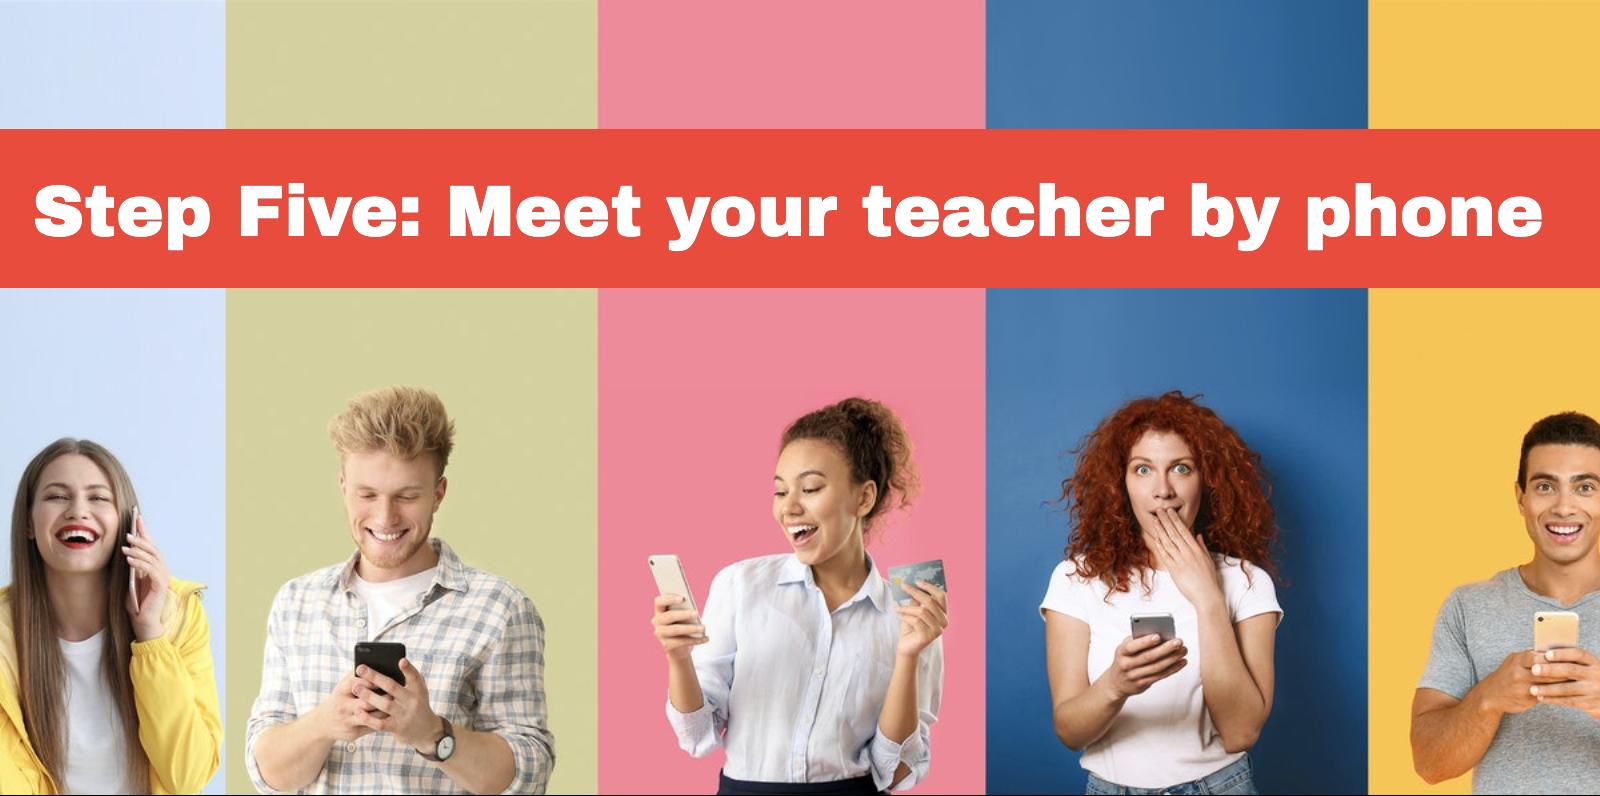 Step 5: Meet your teacher by phone